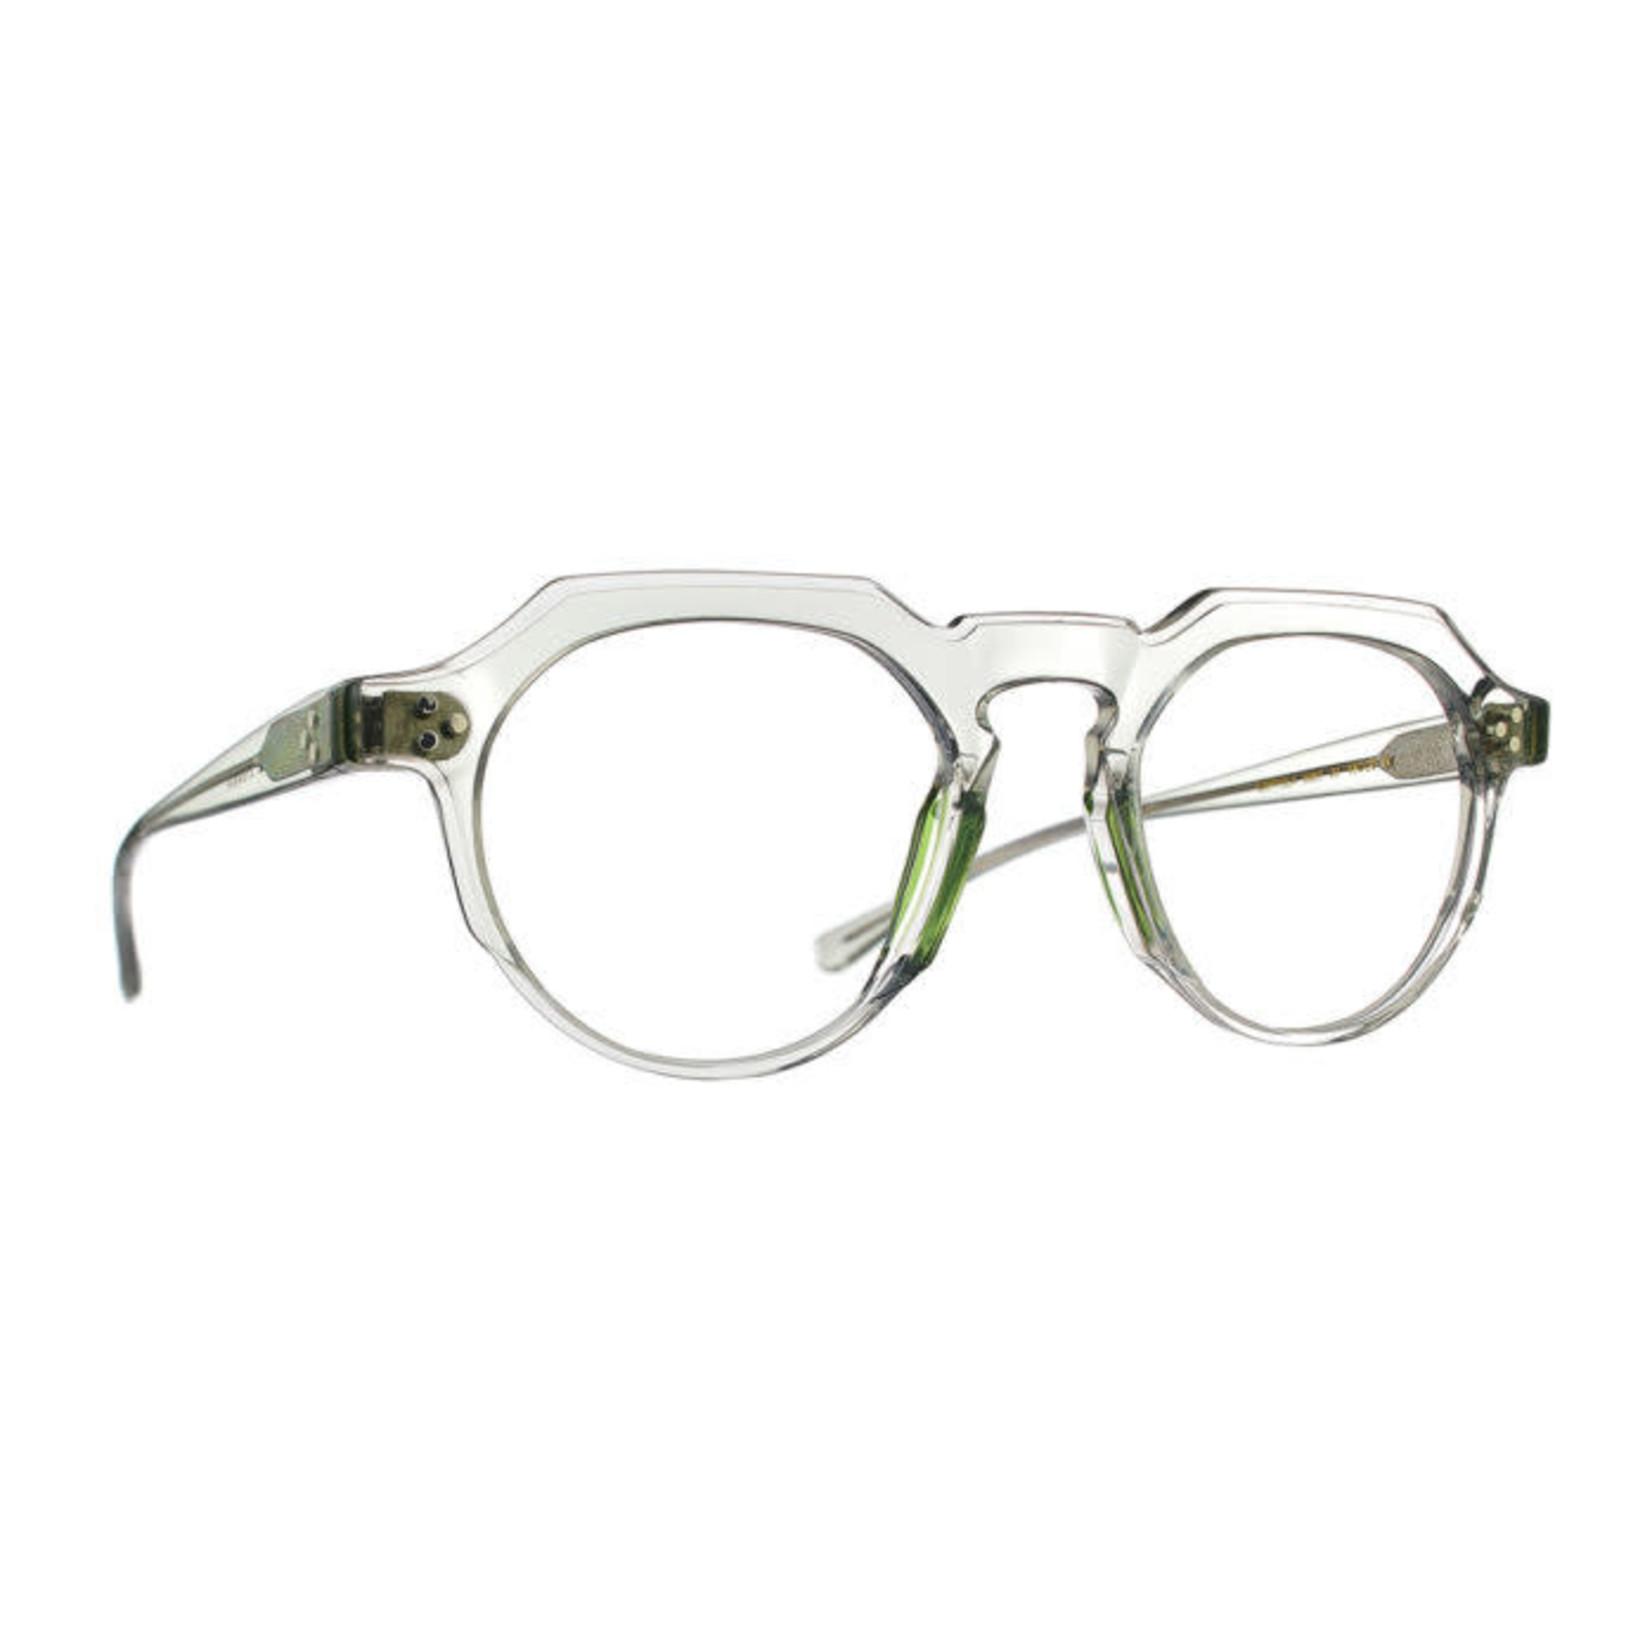 Talla Eyewear Talla Cartola